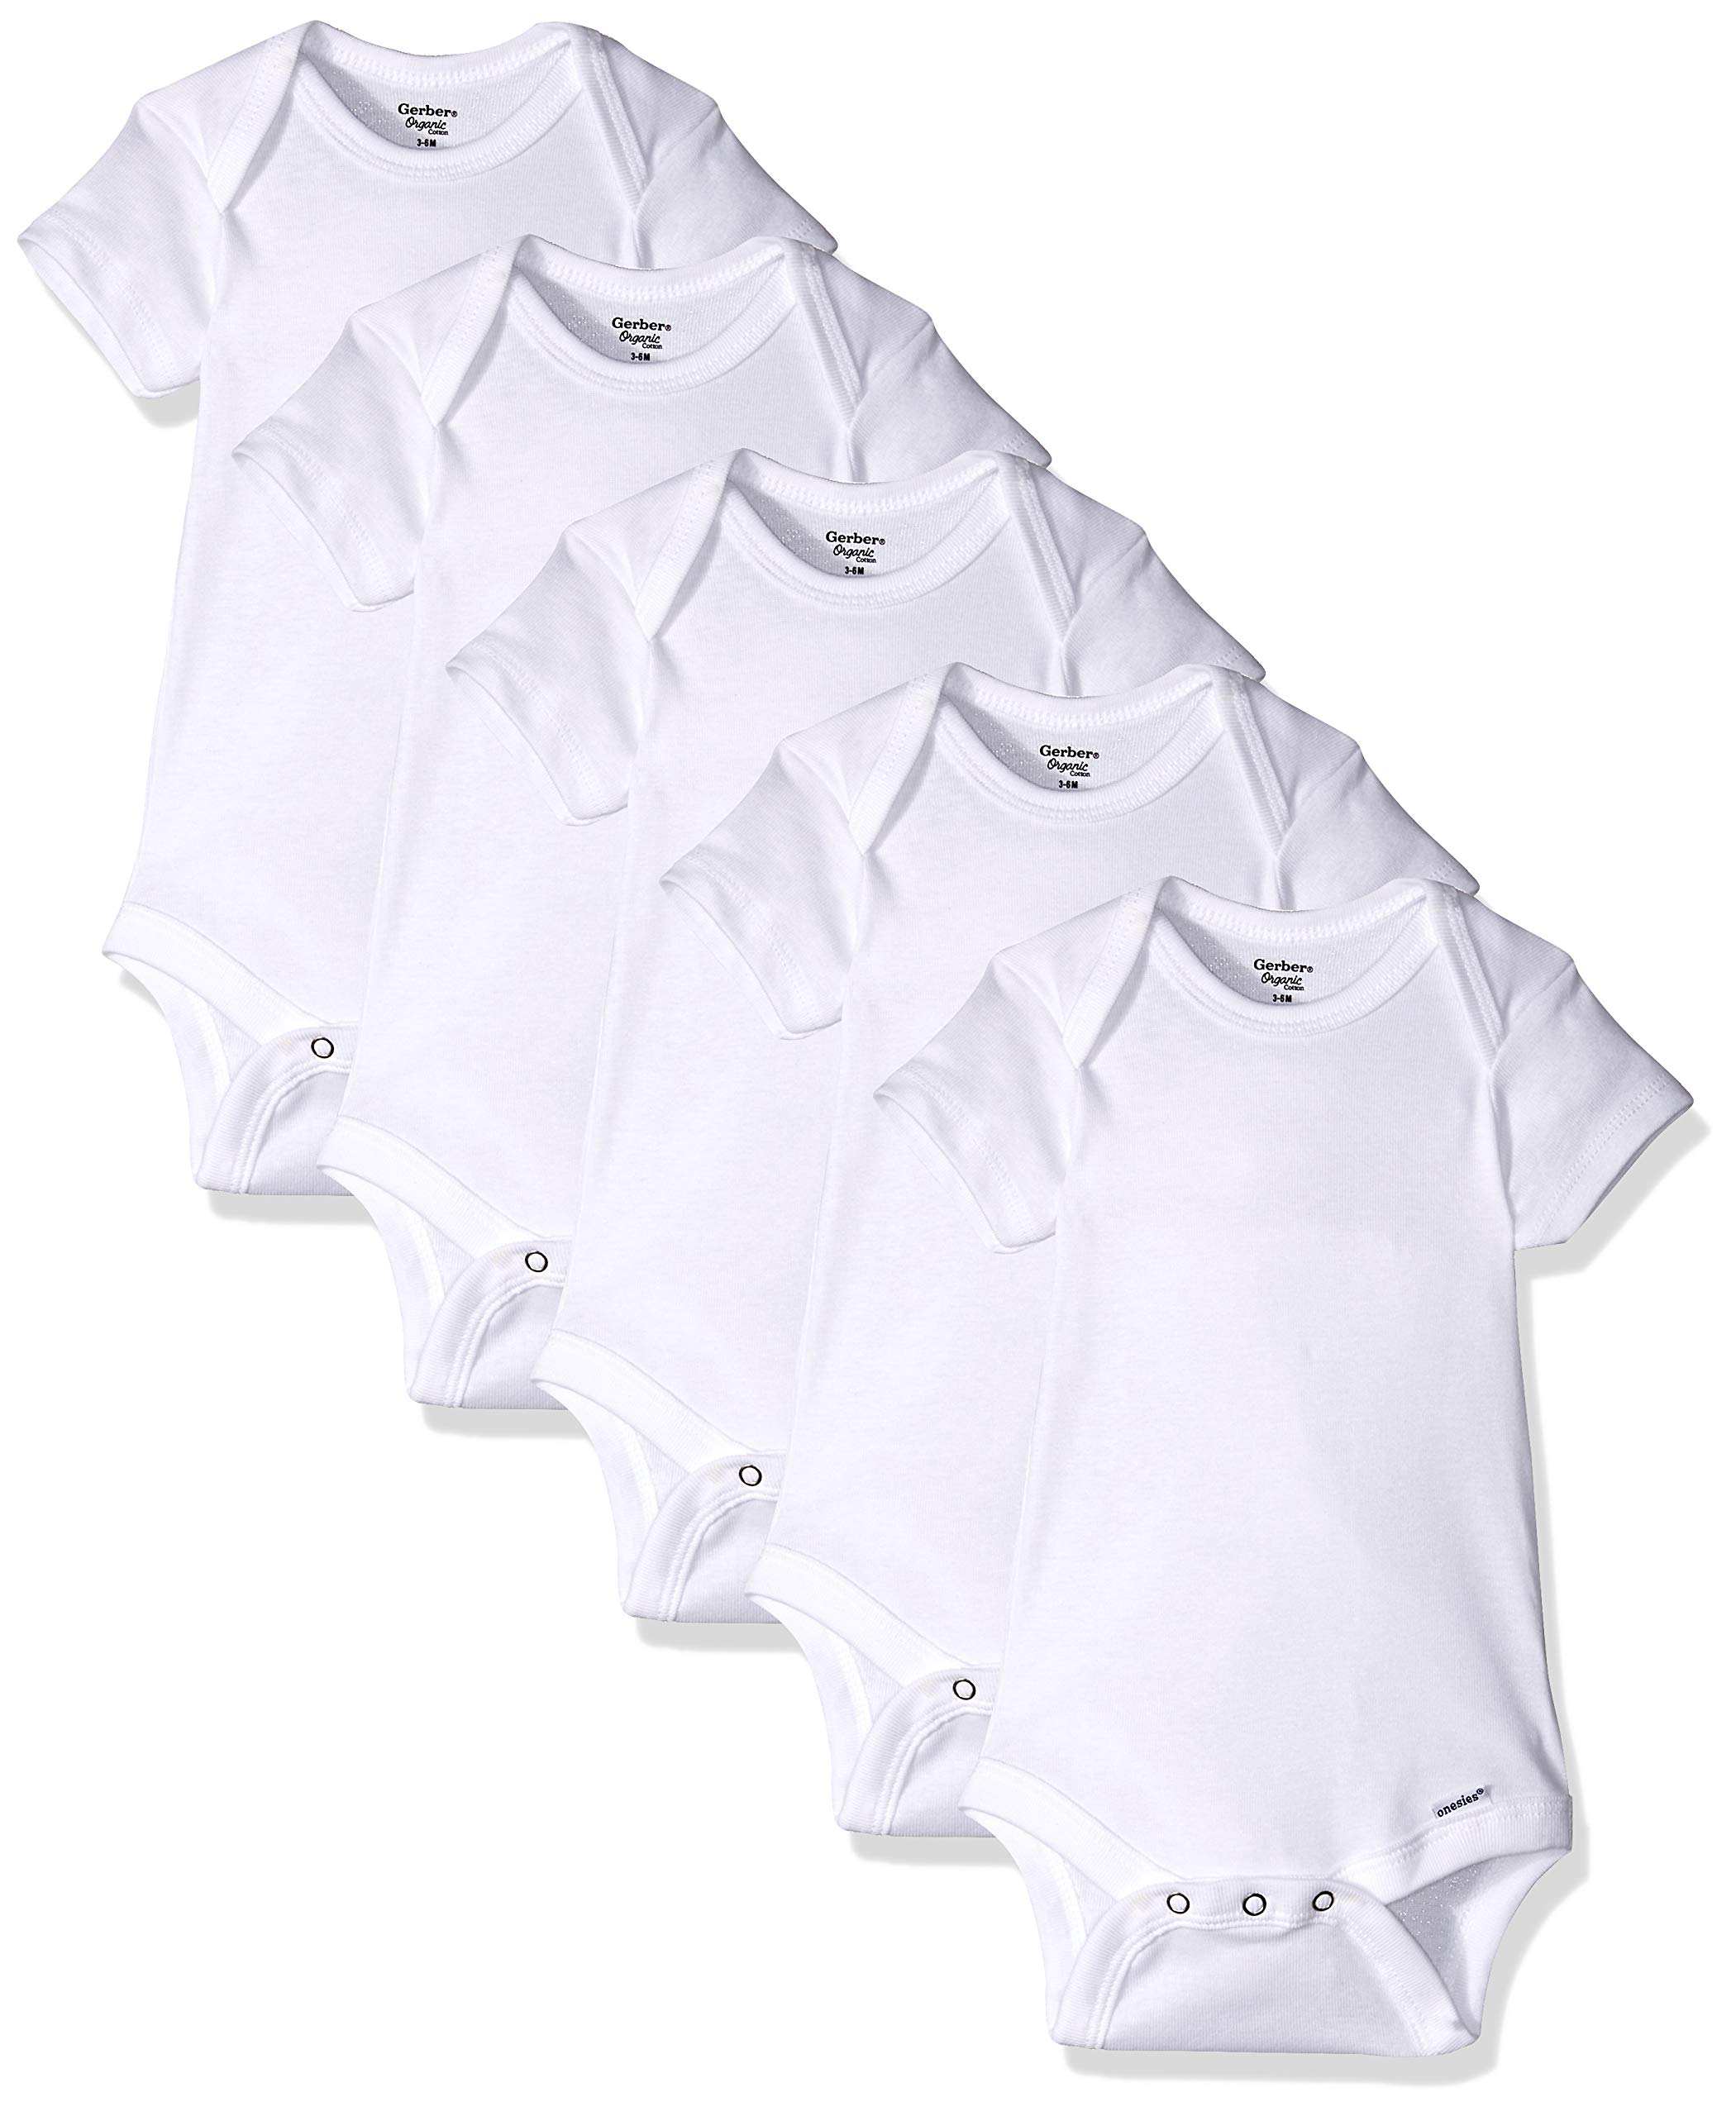 Gerber Organic Short Sleeve Onesies Bodysuit